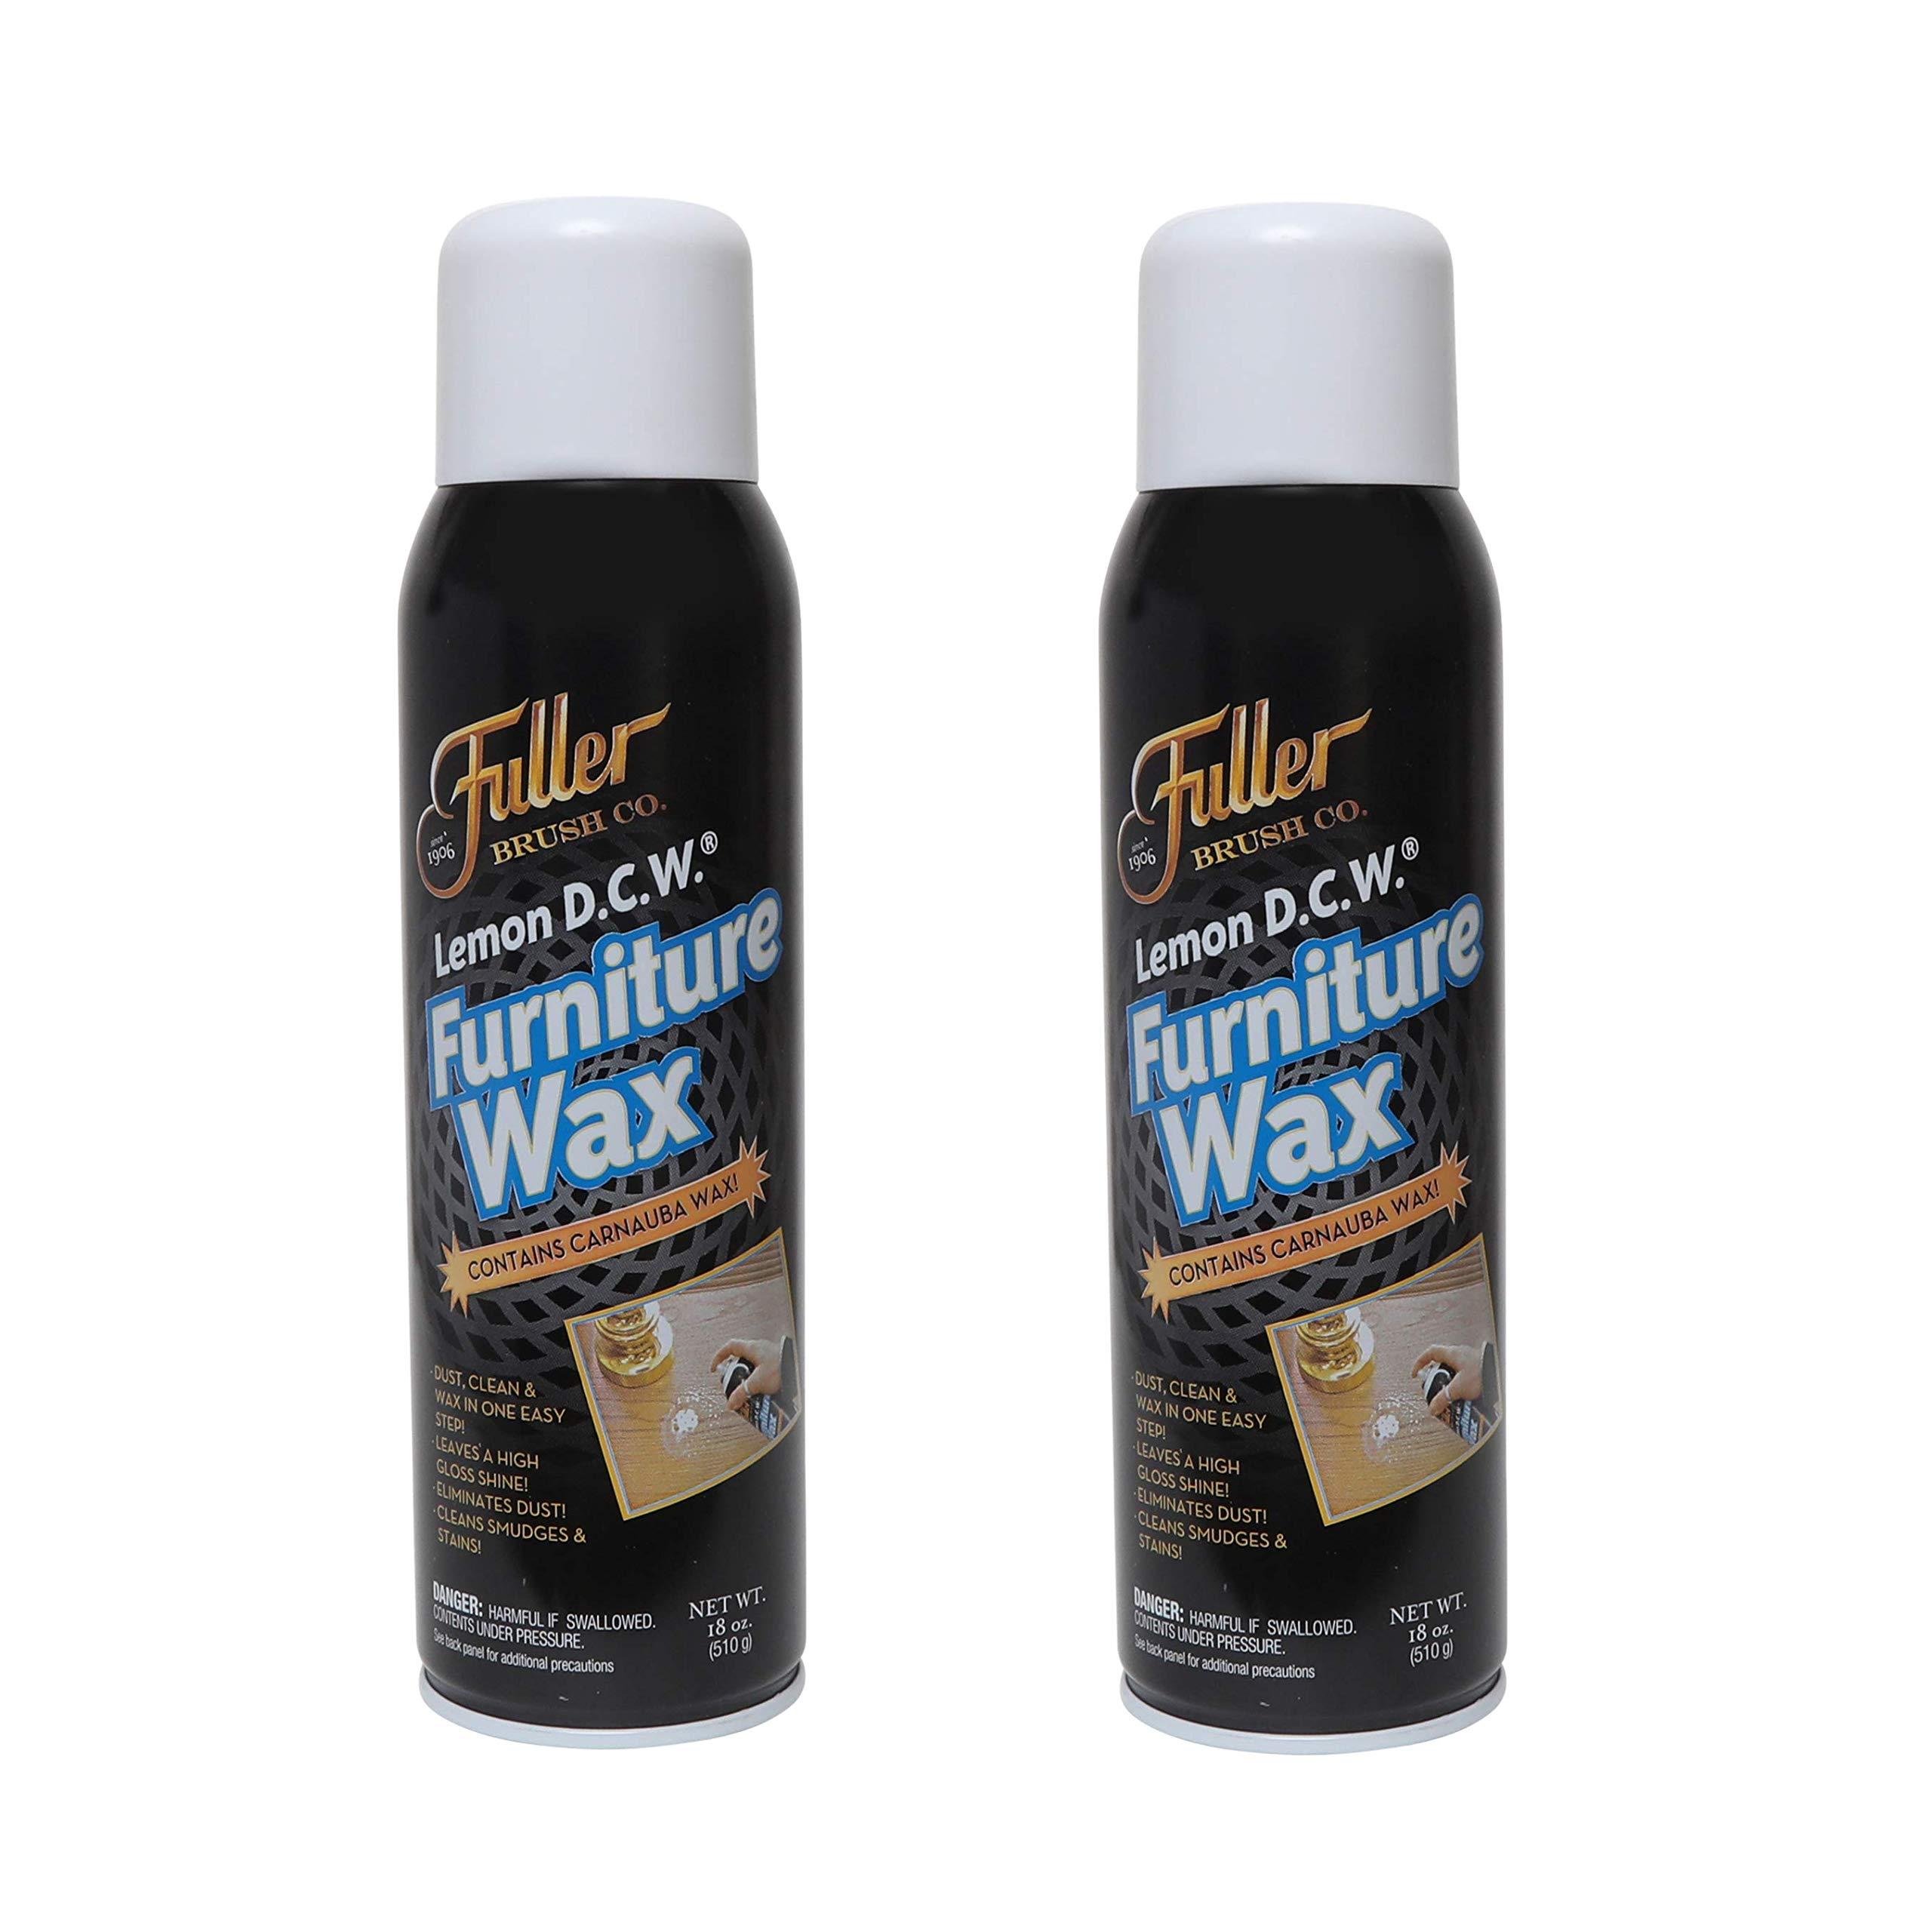 Fuller Brush Lemon D.C.W. Furniture Wax - Dust, Clean & Wax in One Spray - 18 oz. - 2 Pack by Fuller Brush